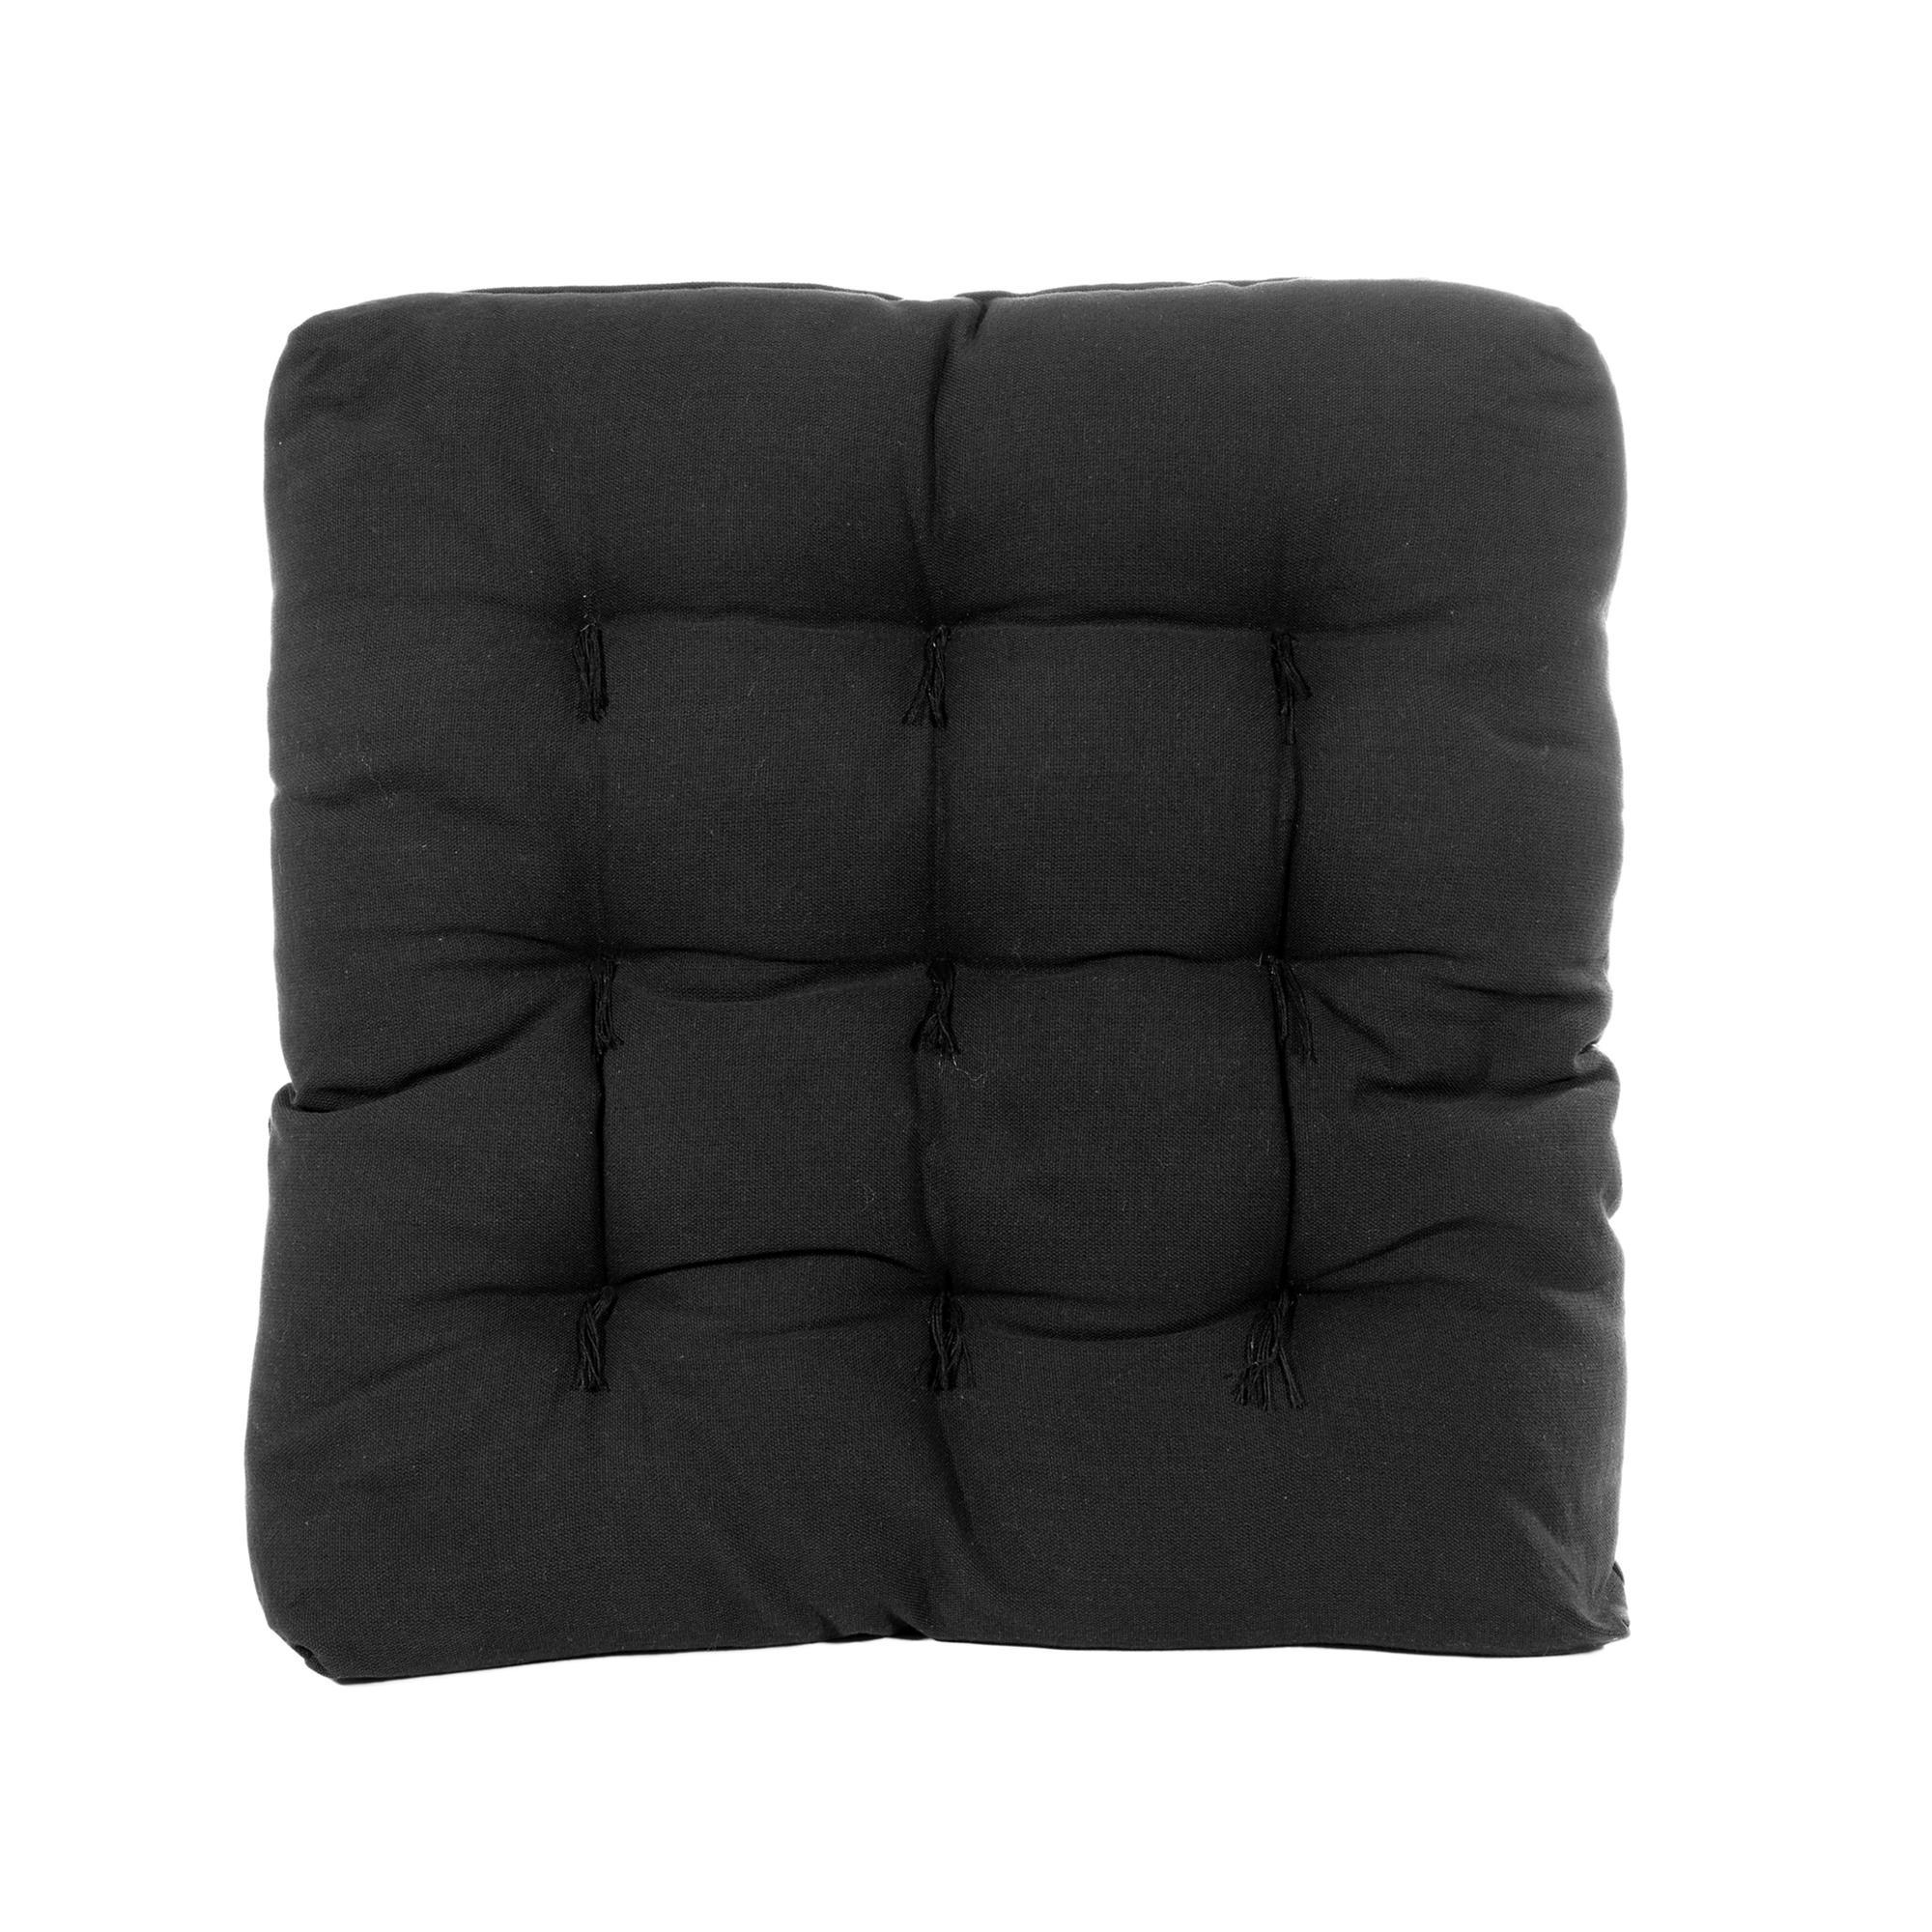 Almofada Futton Confort 40x40 cm Prata - Artesanal